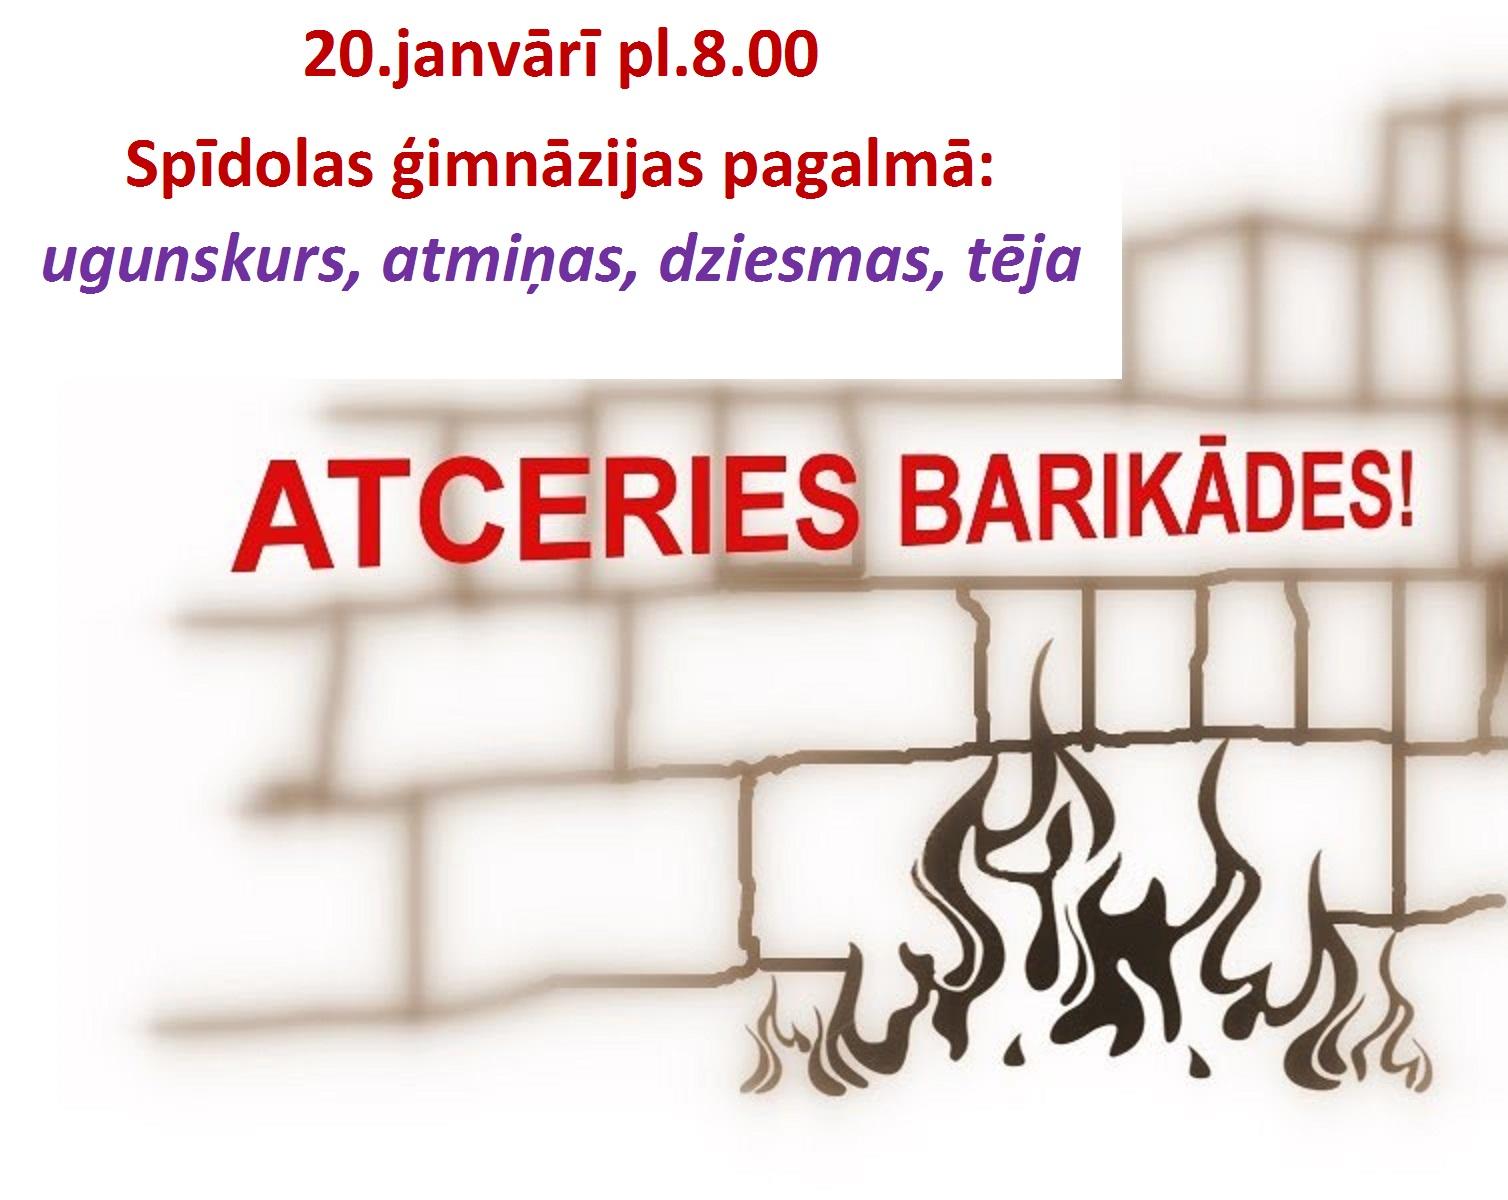 Barikades